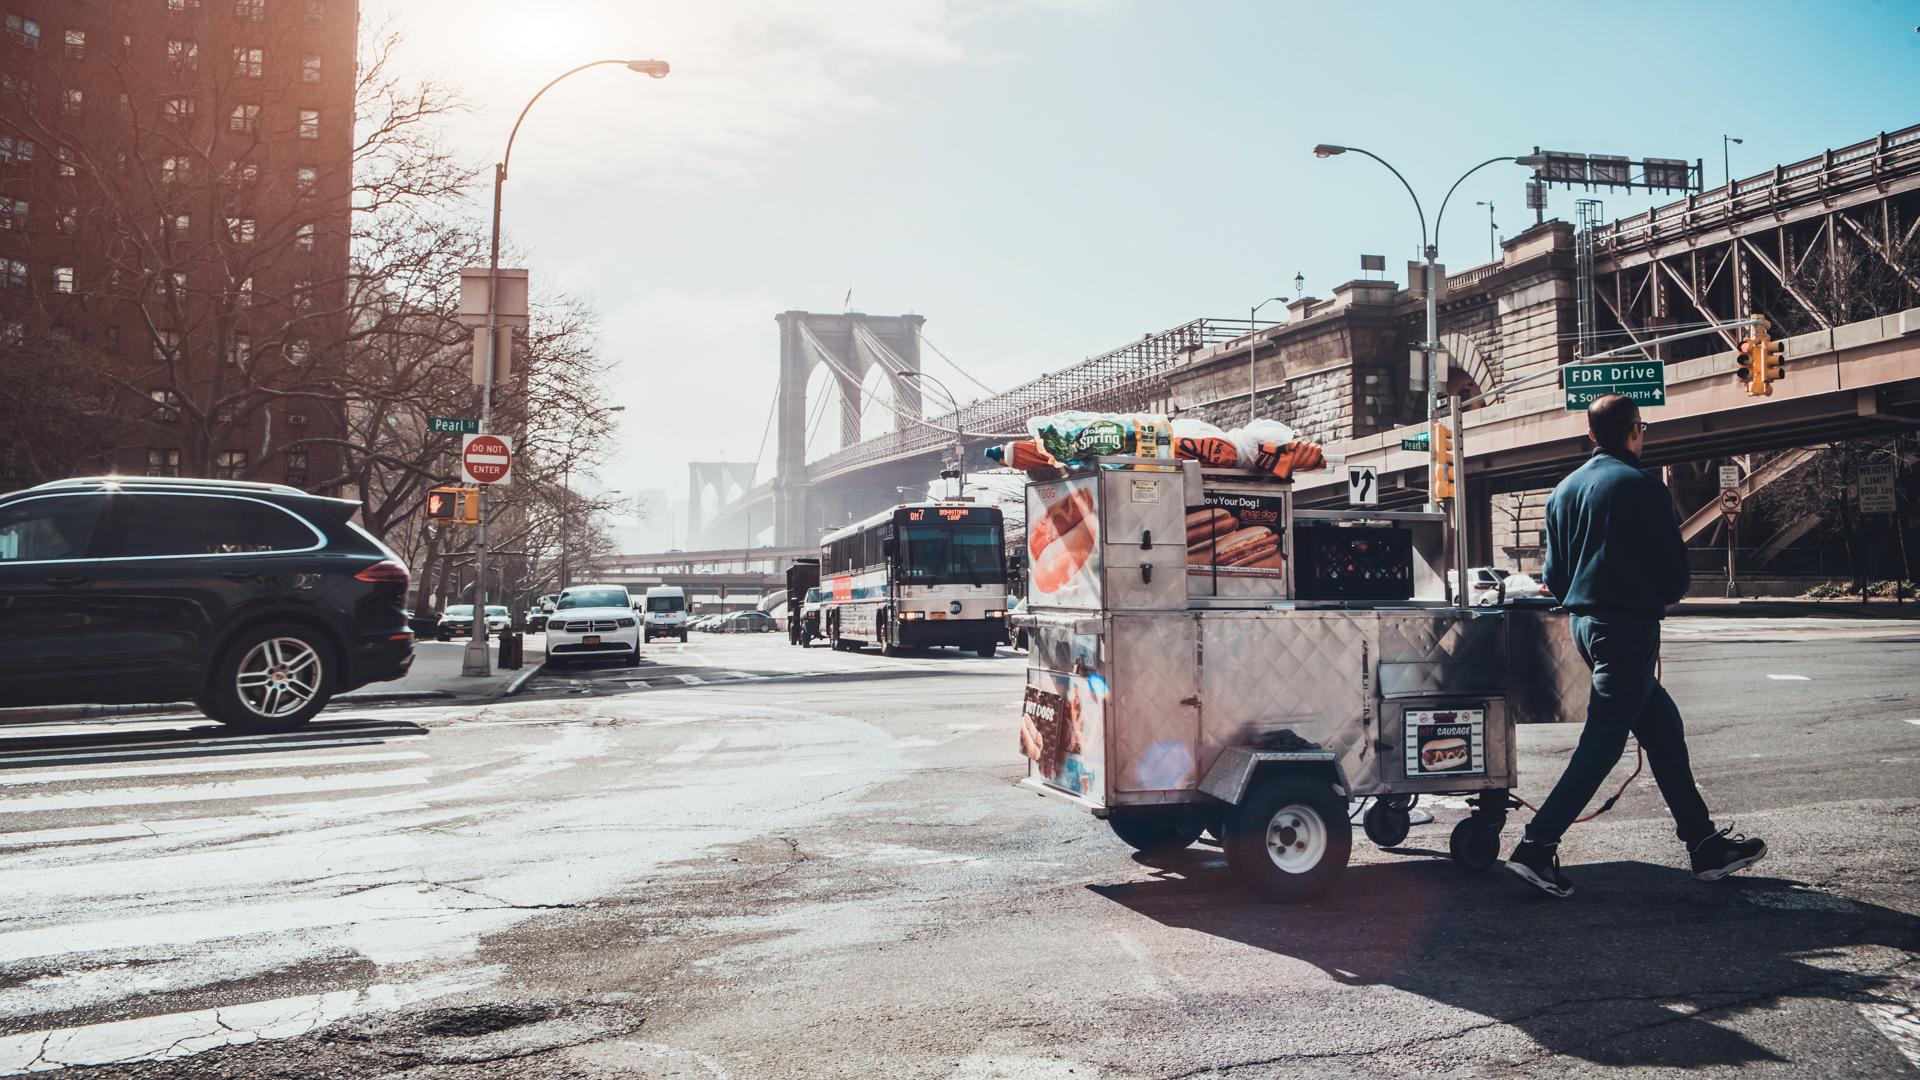 NYC_stijn_hoekstra-34.jpg